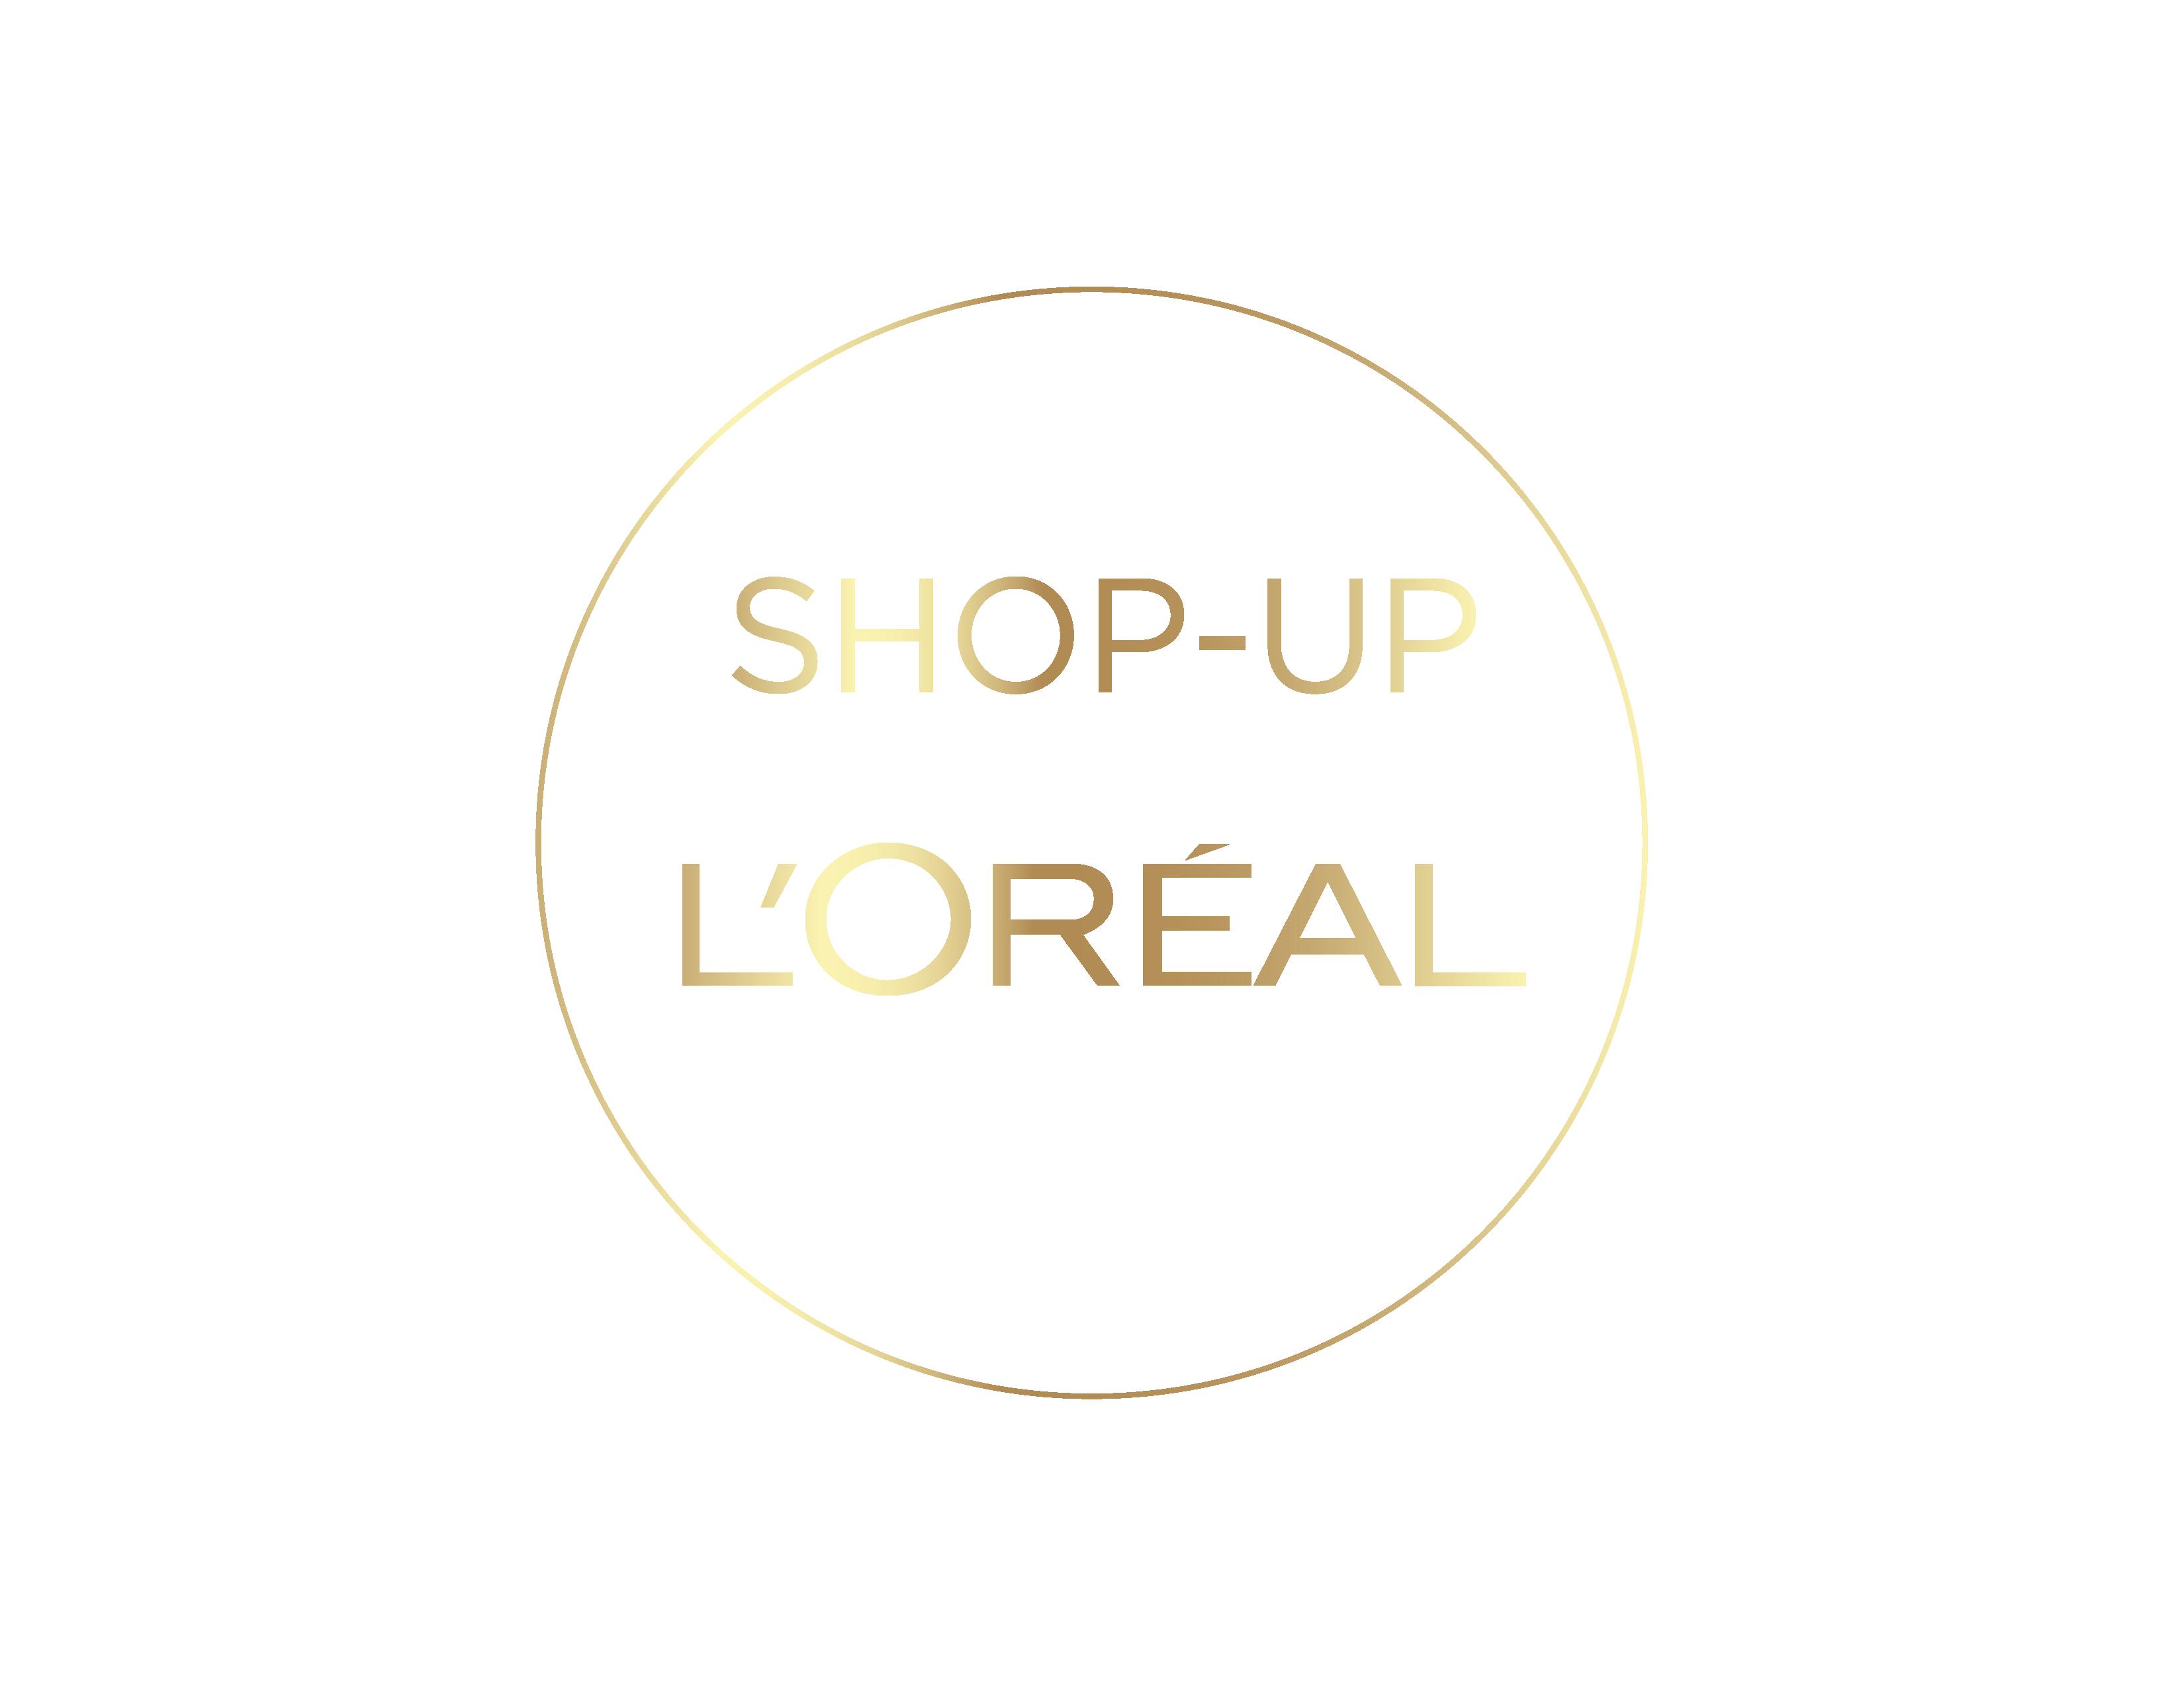 Shop up The L'Oréal Experience: La Aventura de recibir con glamour al verano